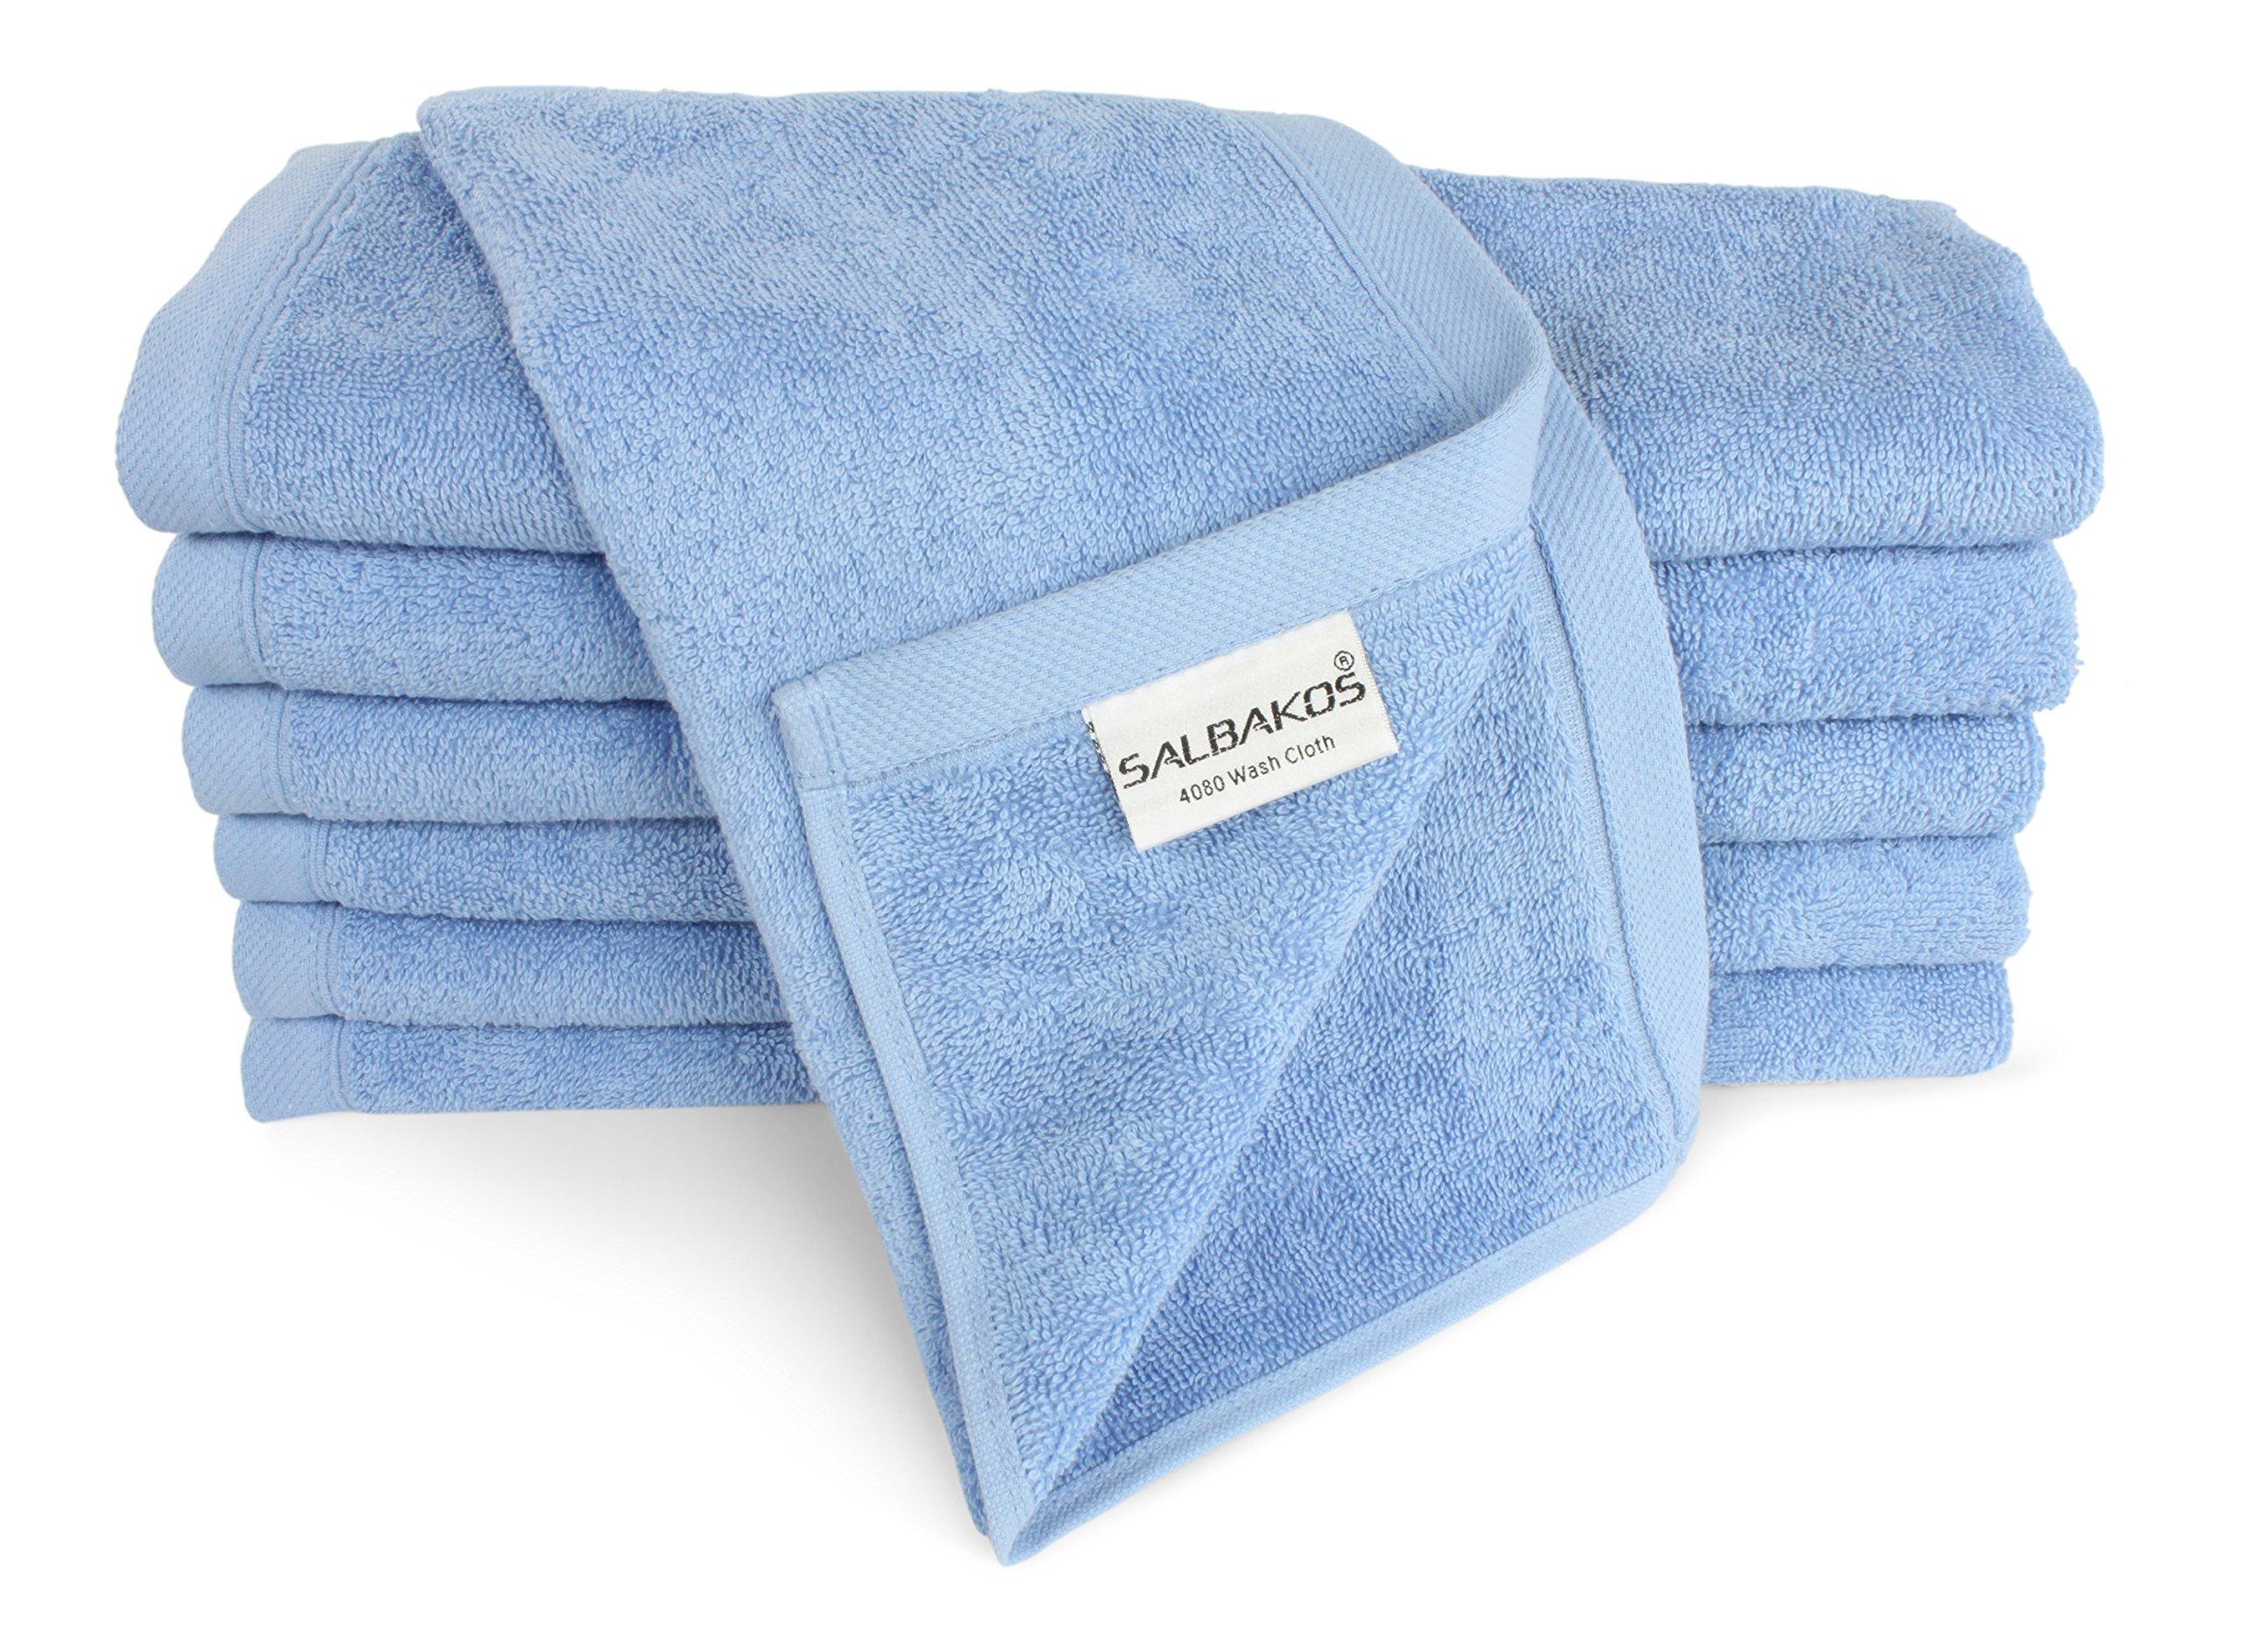 SALBAKOS Luxury Hotel & Spa Turkish Cotton 12-Piece Eco-Friendly Washcloth Set Bath, Blue